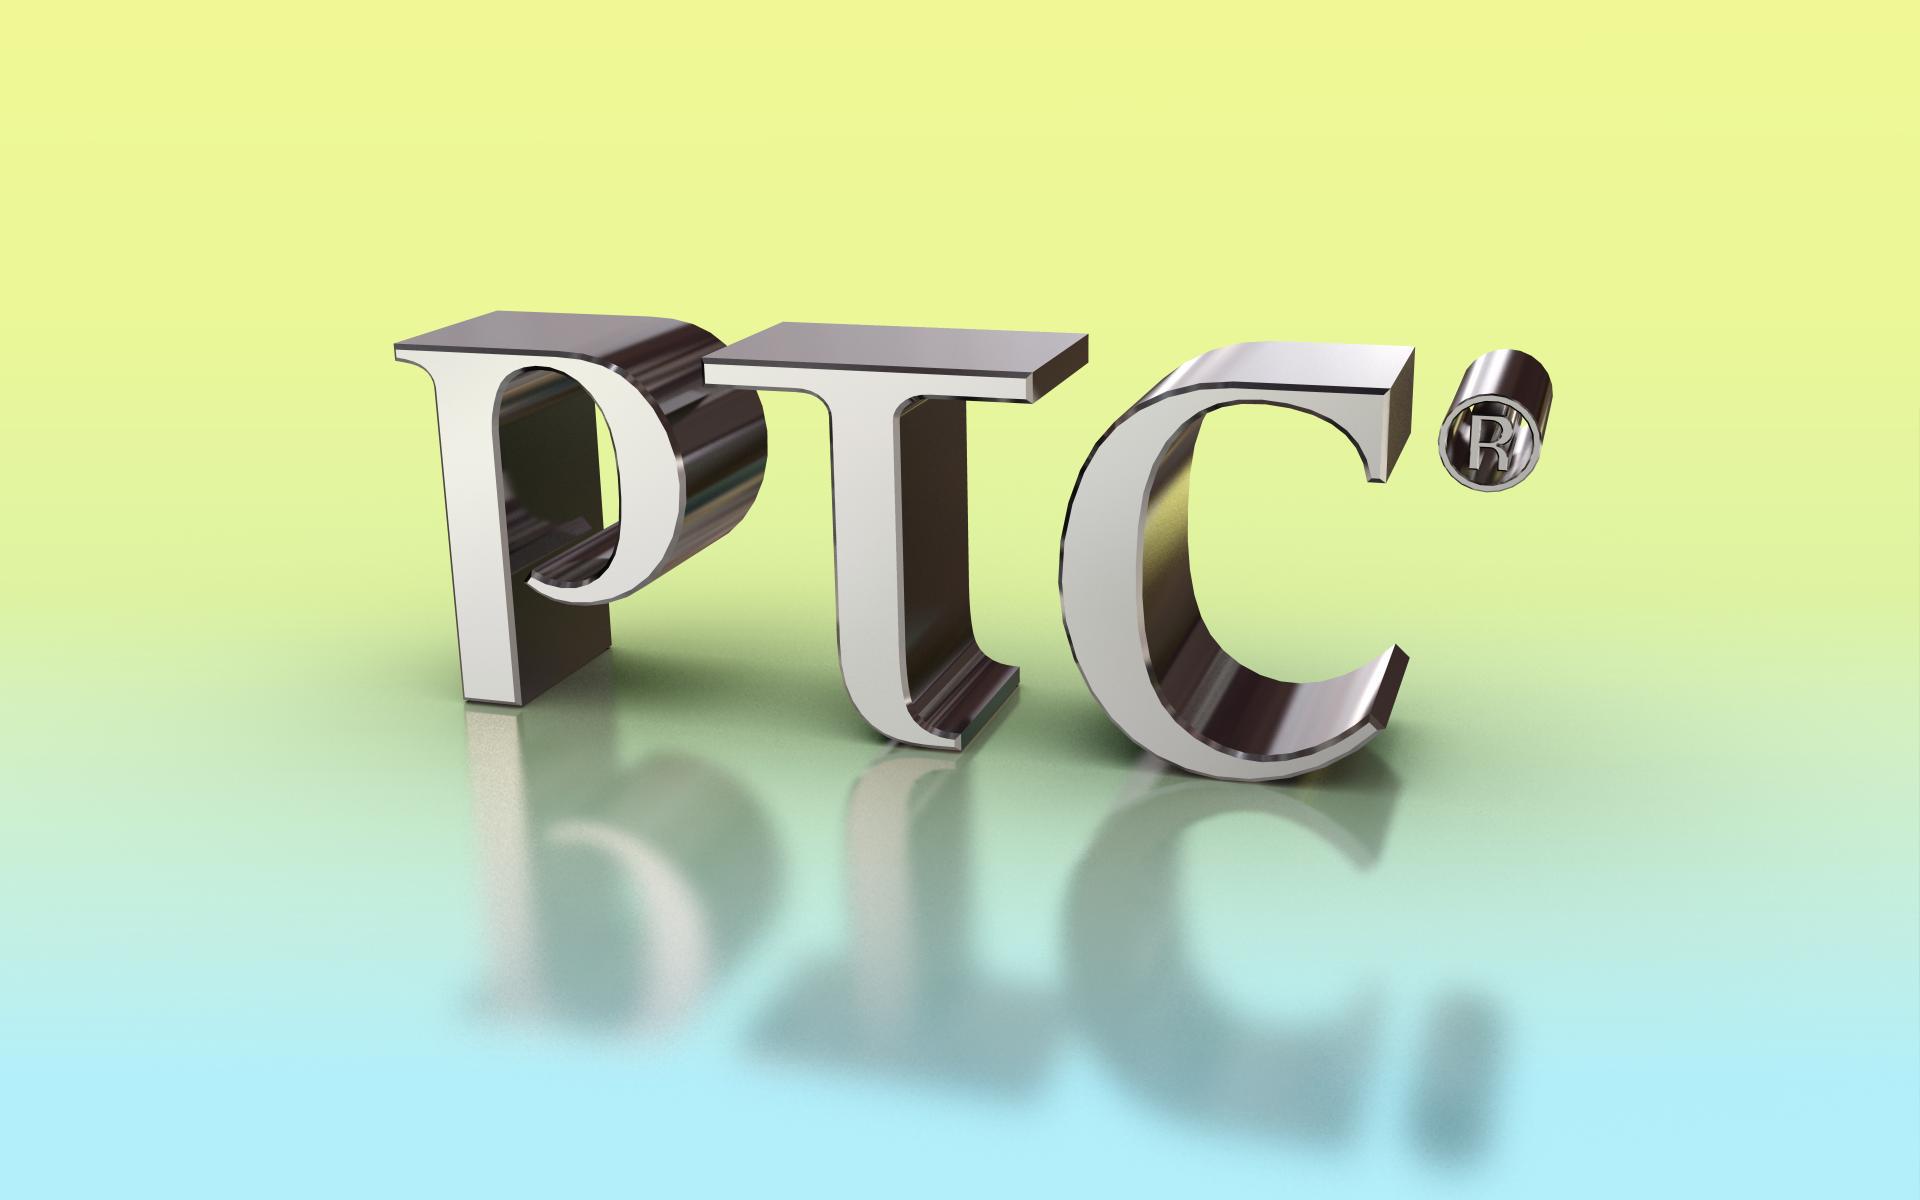 PTC_NEW_LOGO-1.jpg